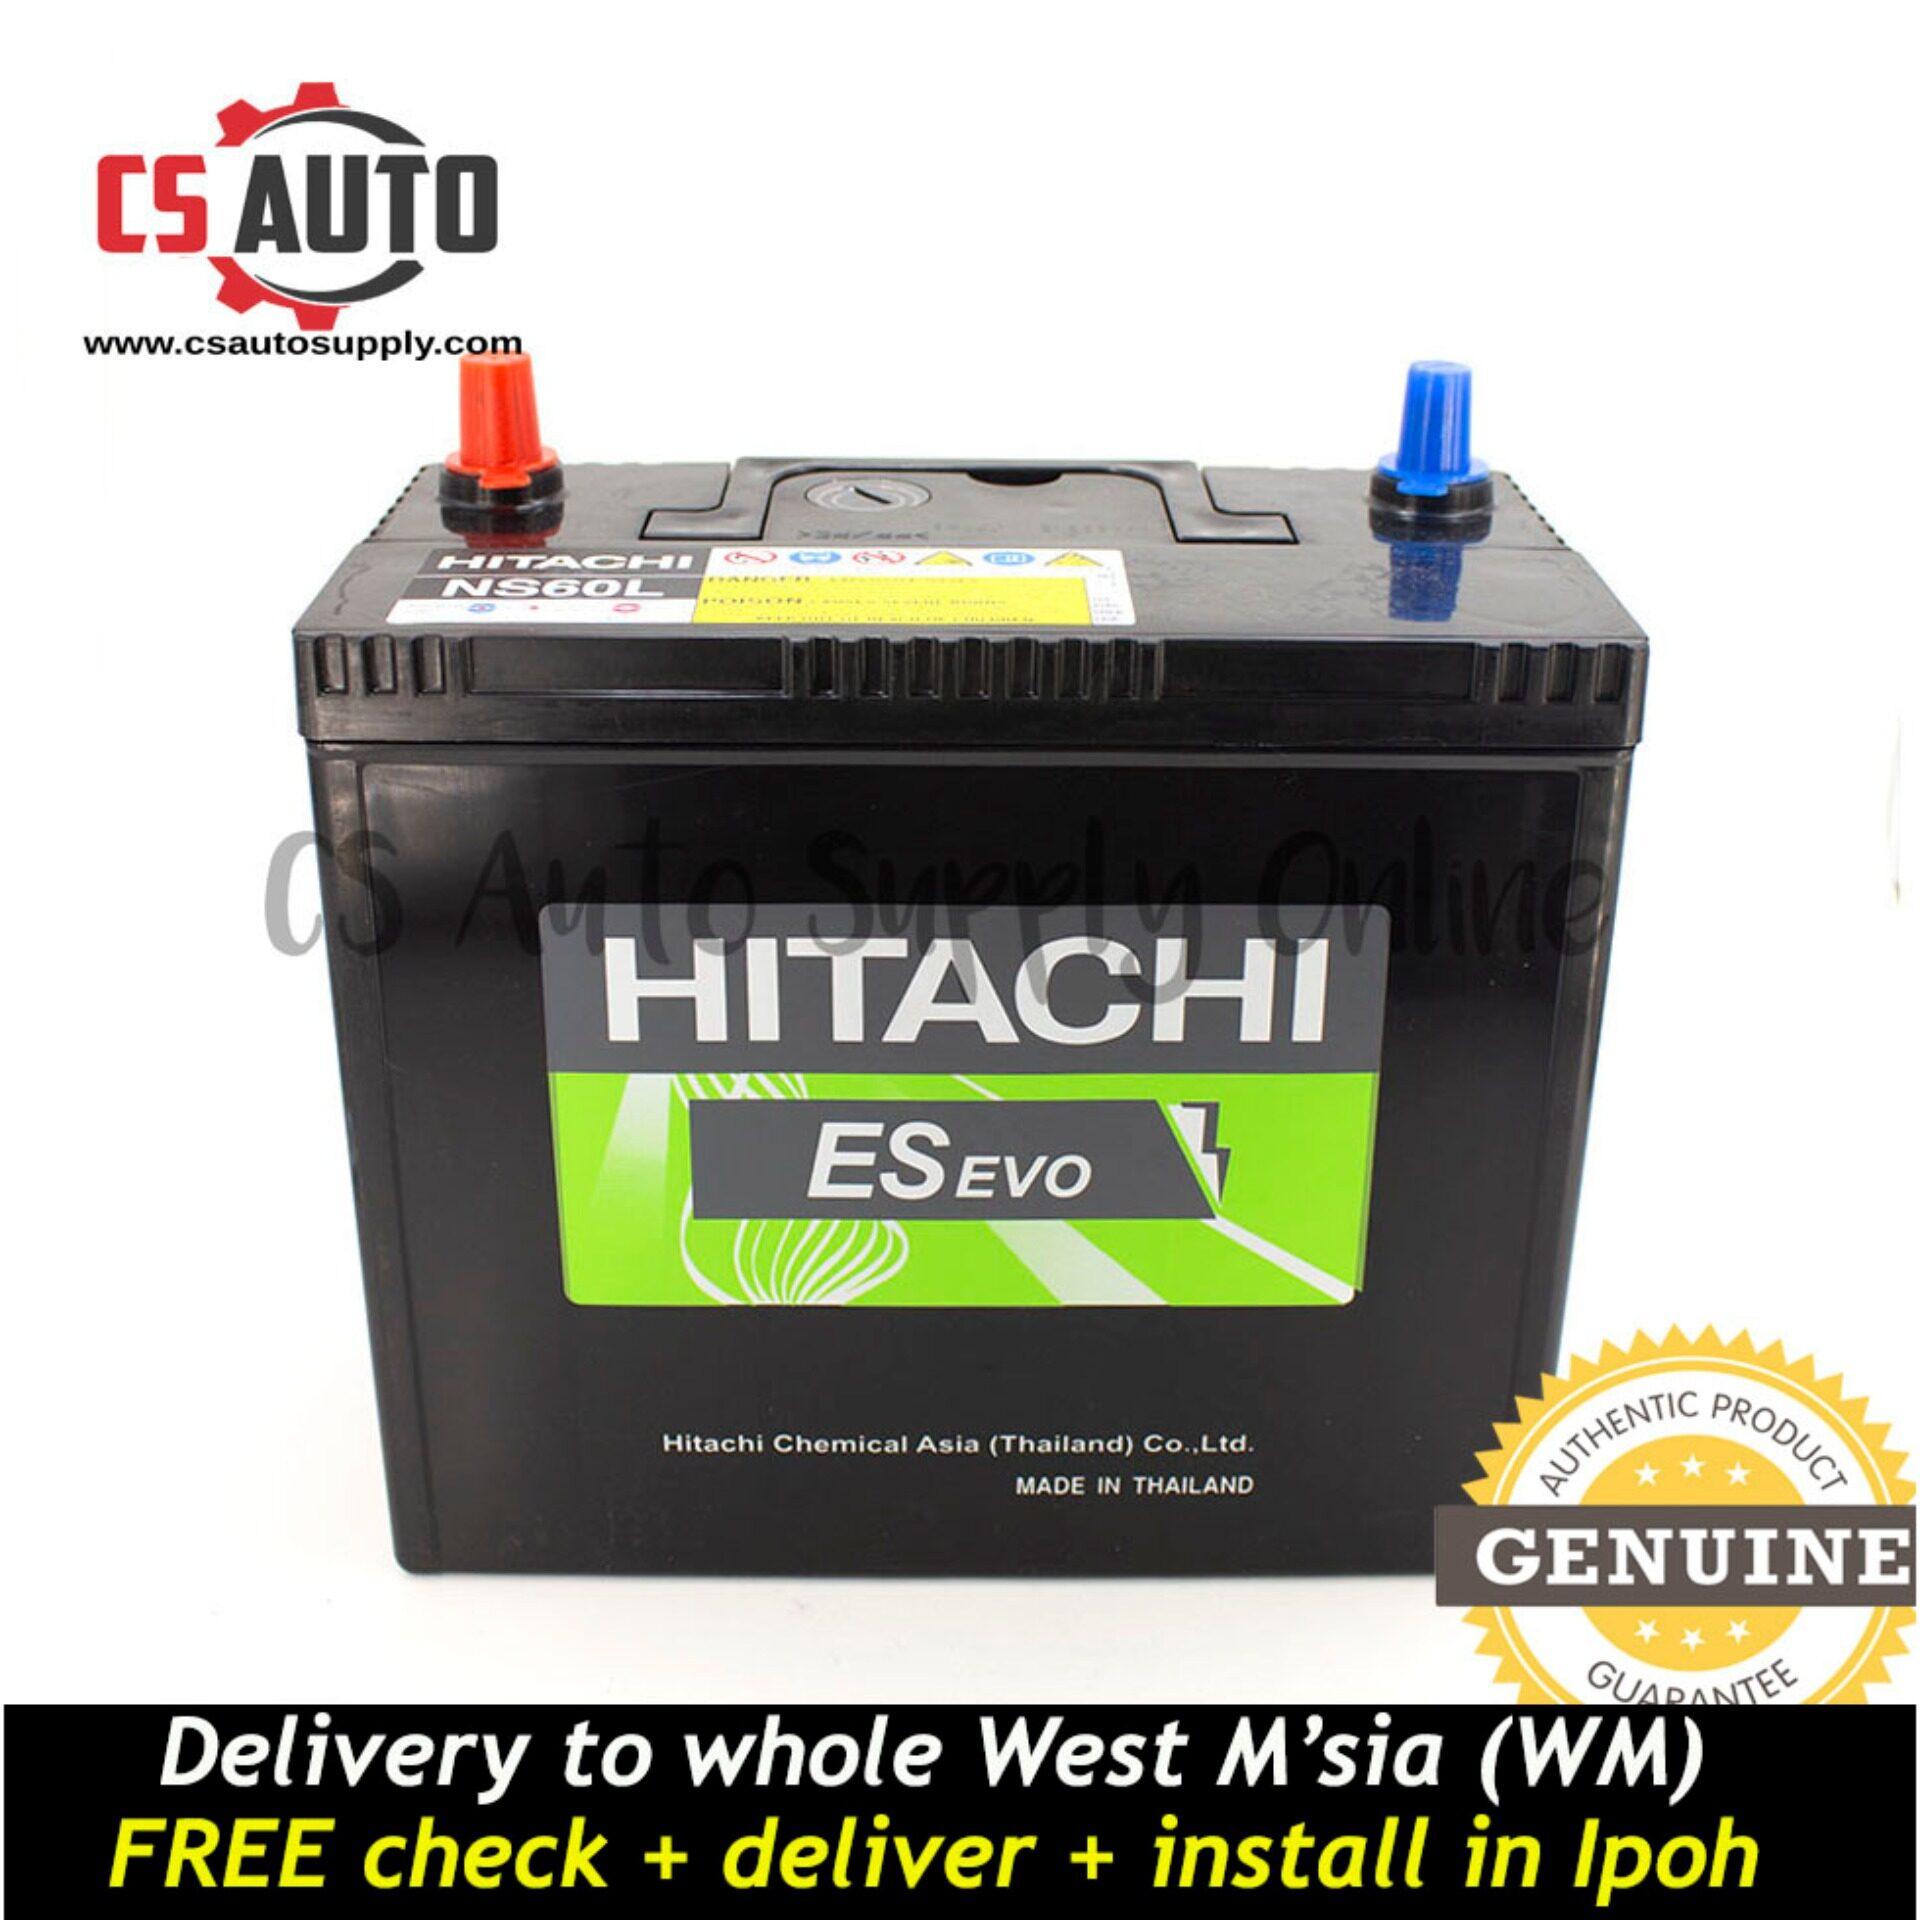 Hitachi NS60L NS60LS ES Battery MF for Proton Iswara, Waja, Toyota Vios, Altis, RAV, Honda CR-V, Honda Civic Ipoh area